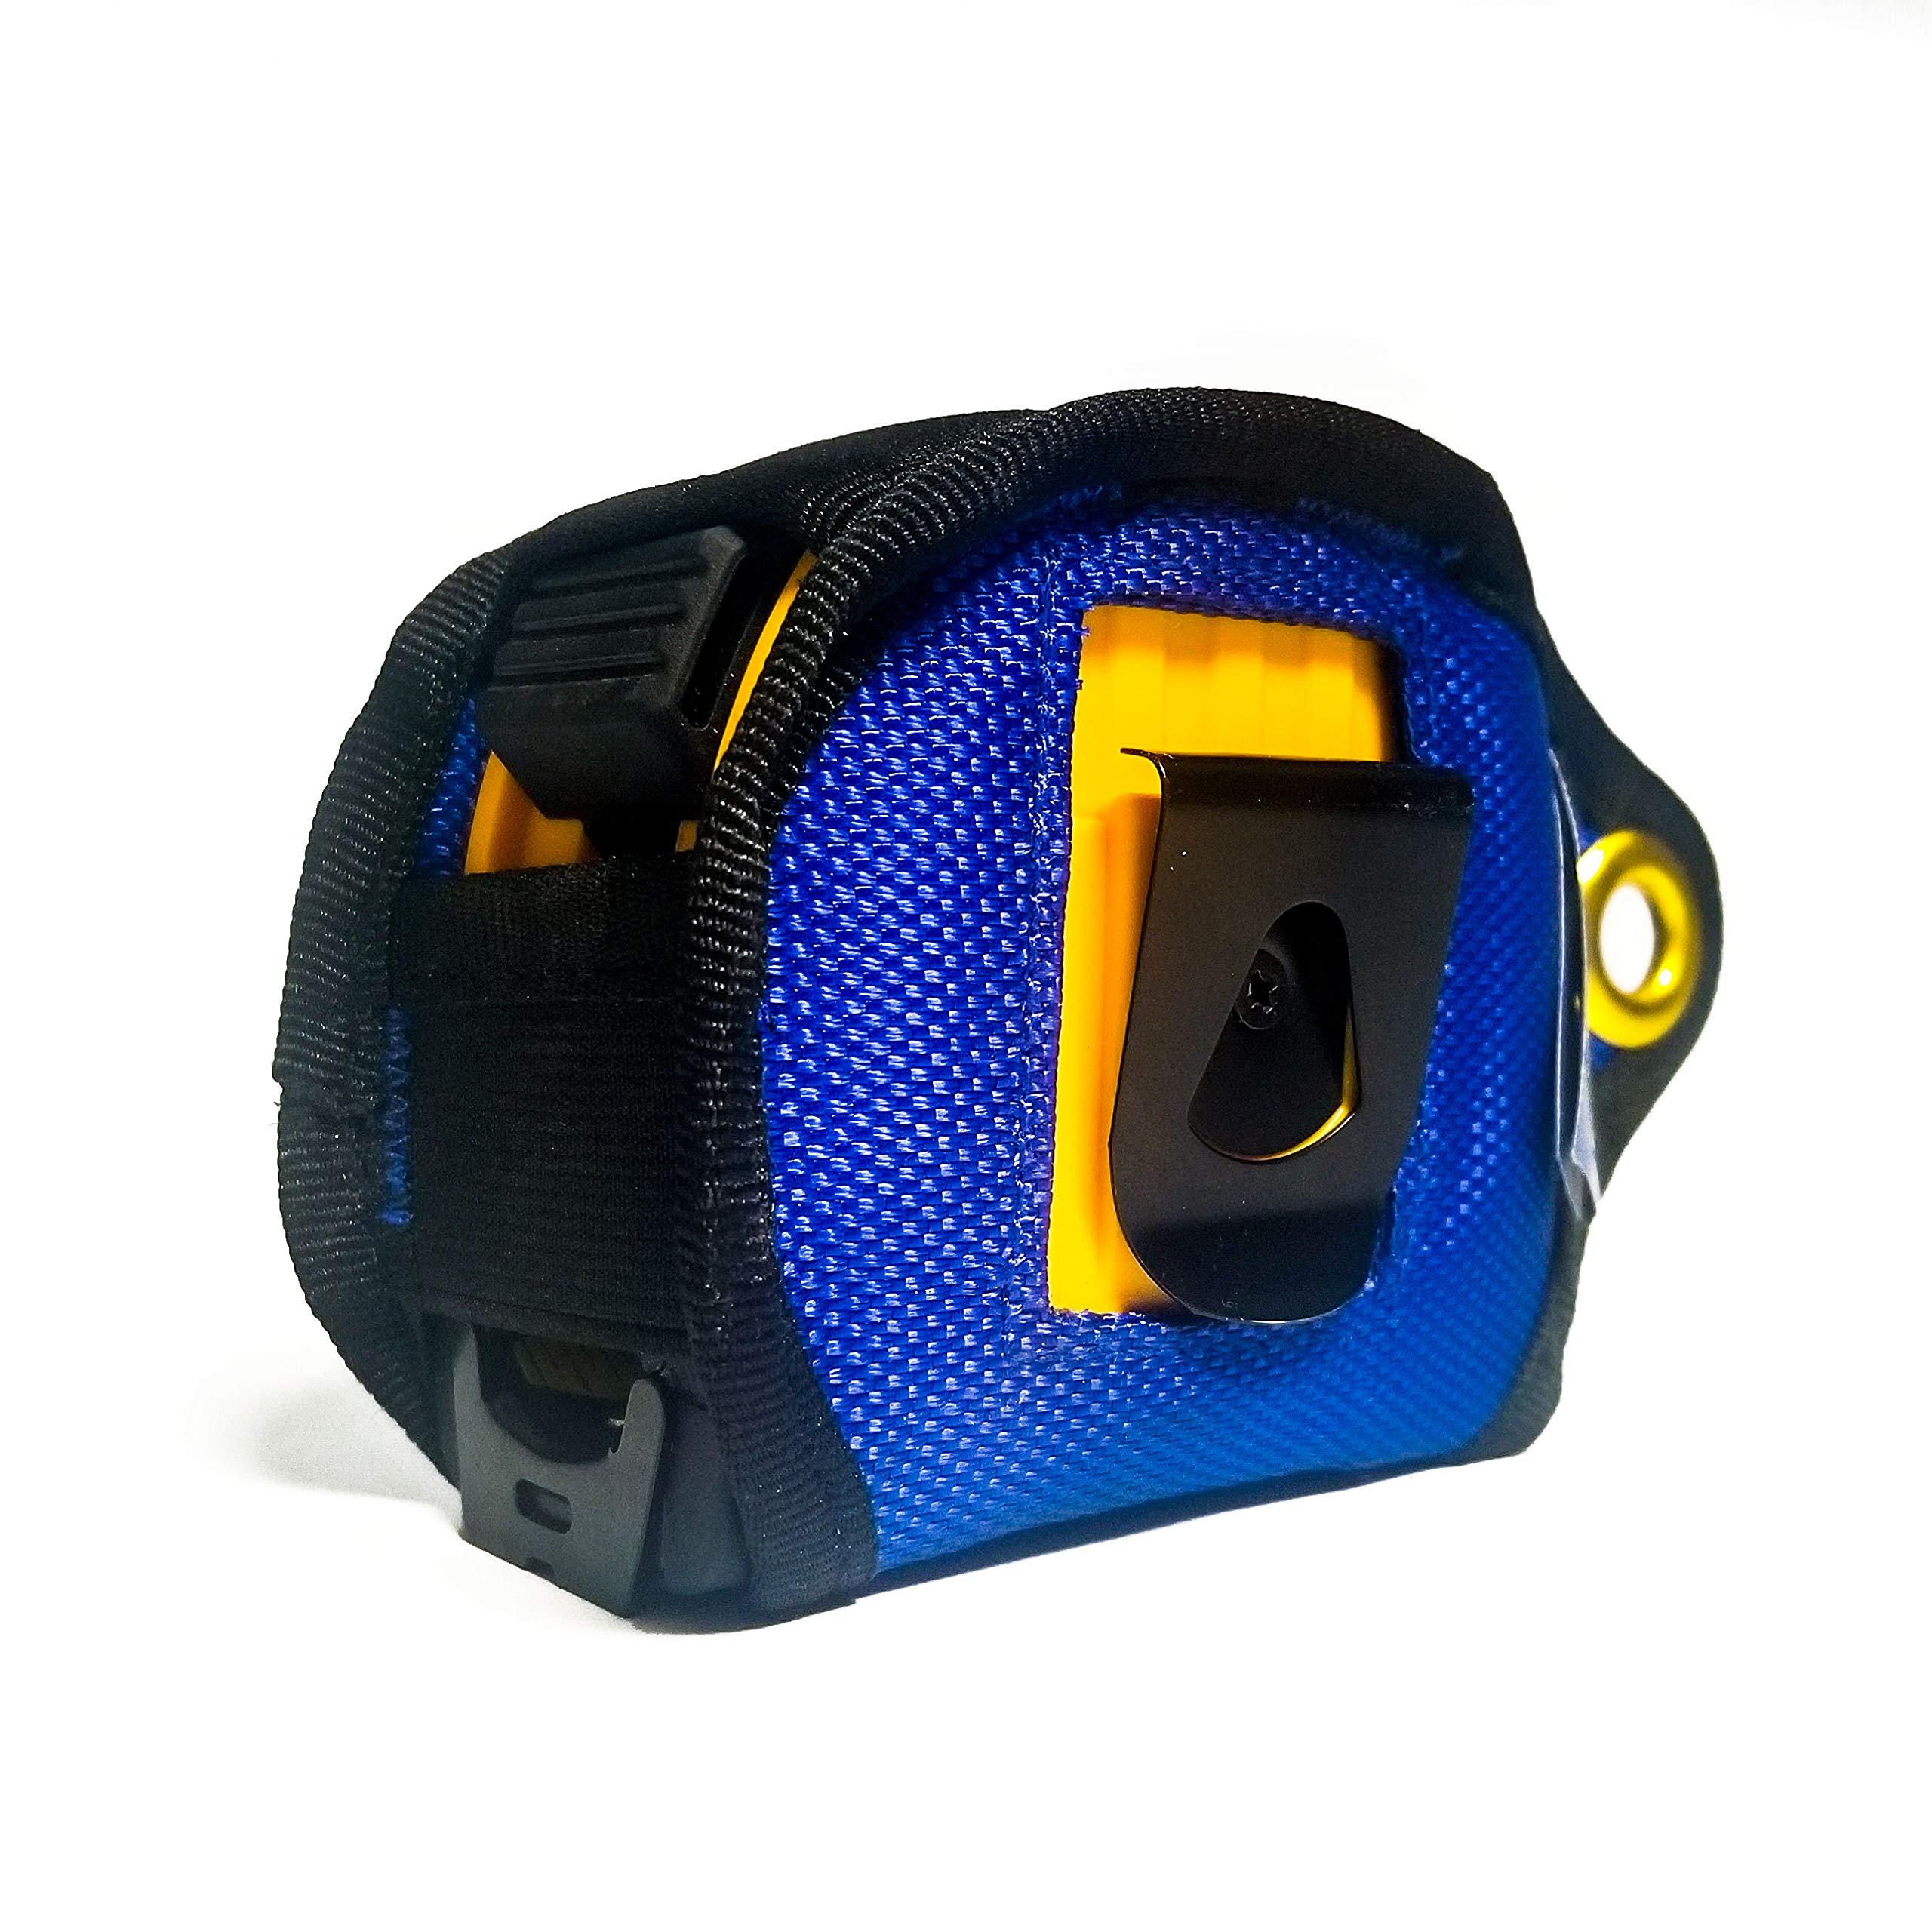 KEY-BAK Pro Toolmate ANSI 121 Compliant Tape Measure Jacket Tool Attachment by Key-Bak Professional (Image #1)